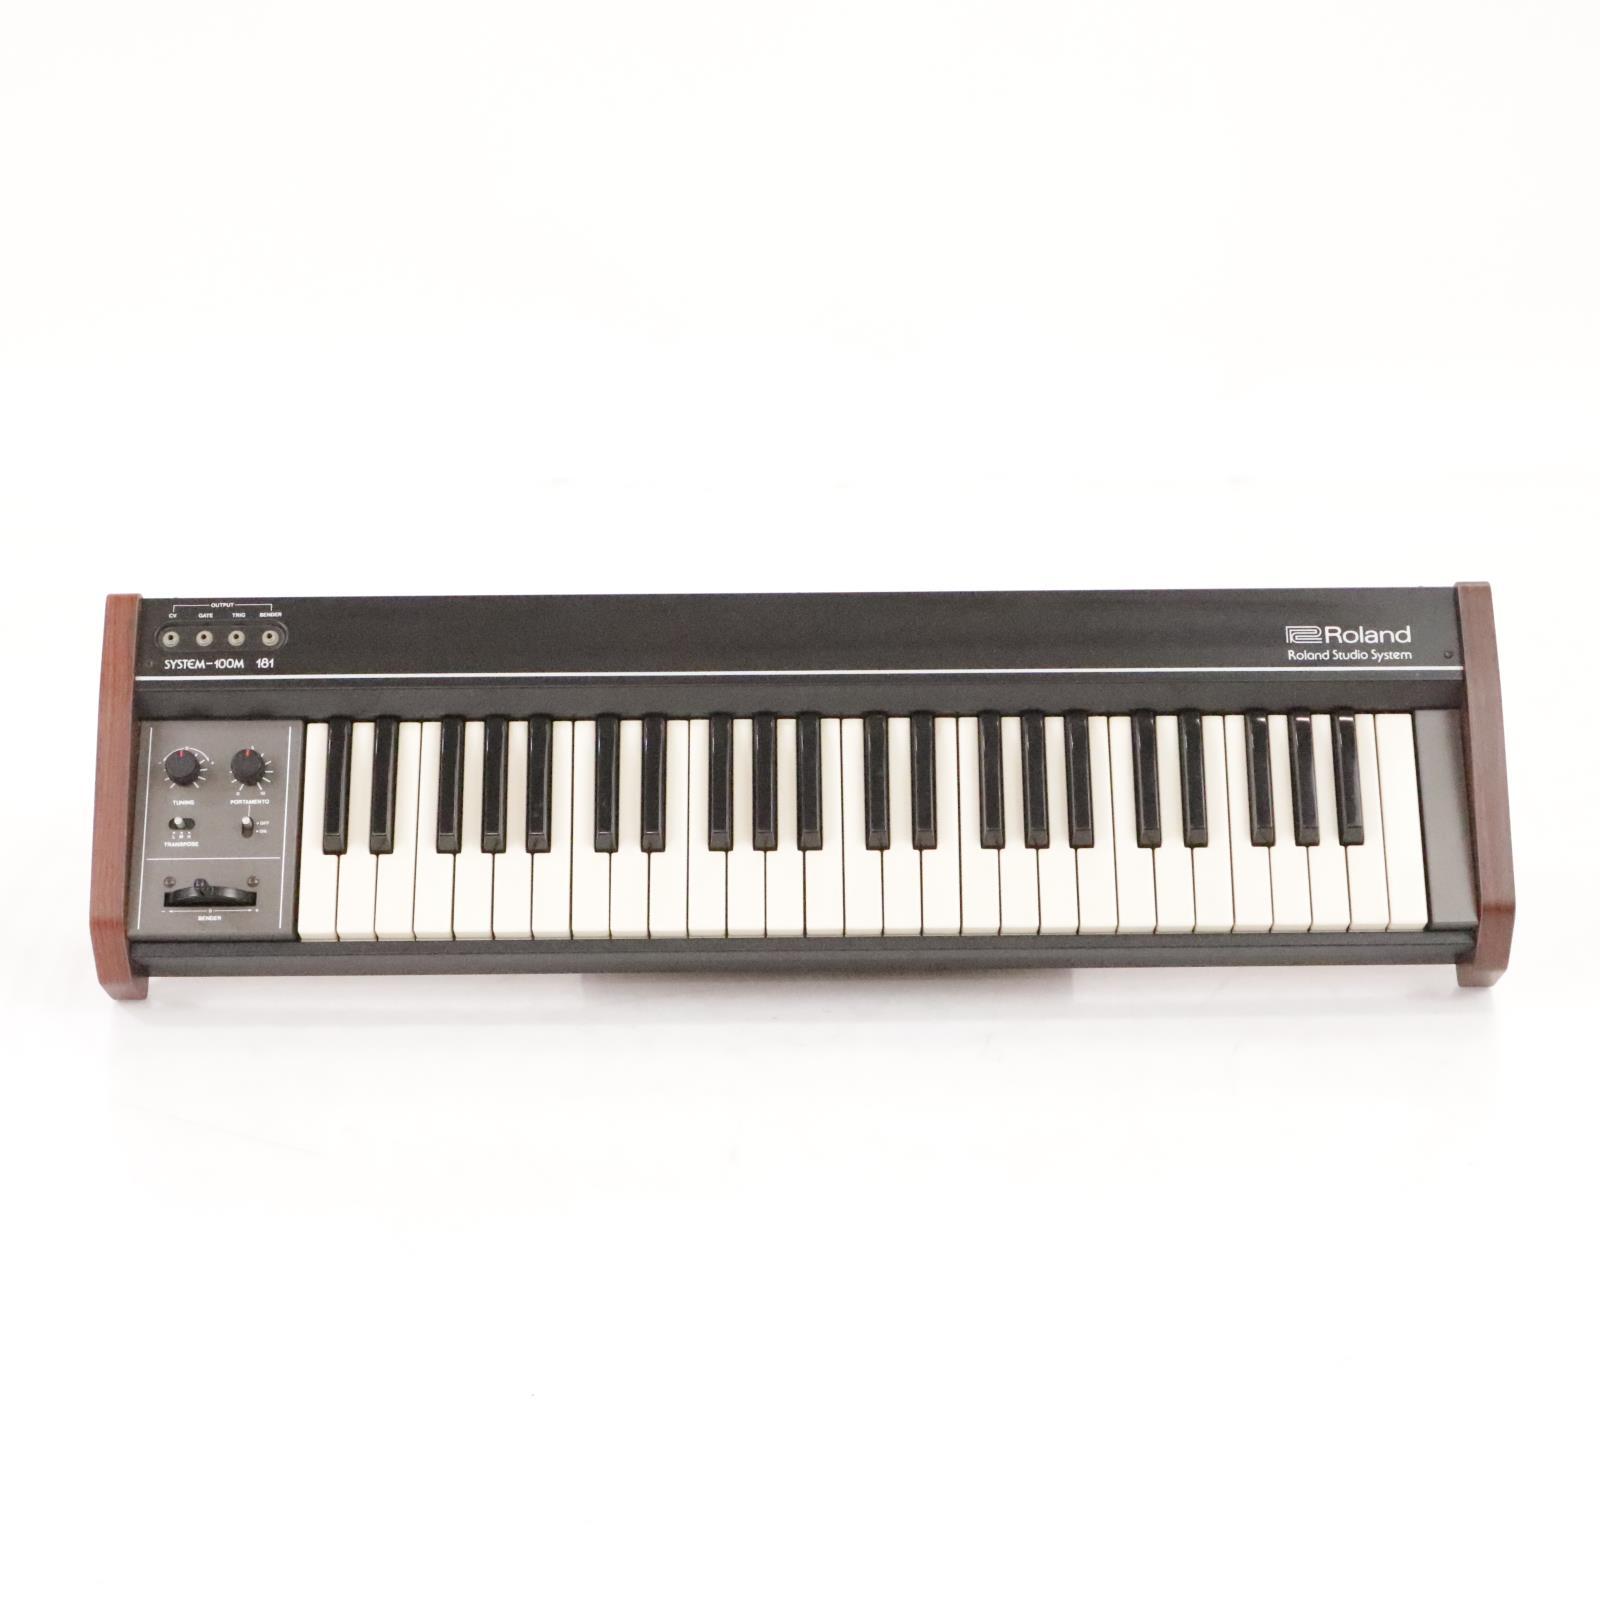 Roland Studio System-100m Model 181 CV Controller Keyboard #36572